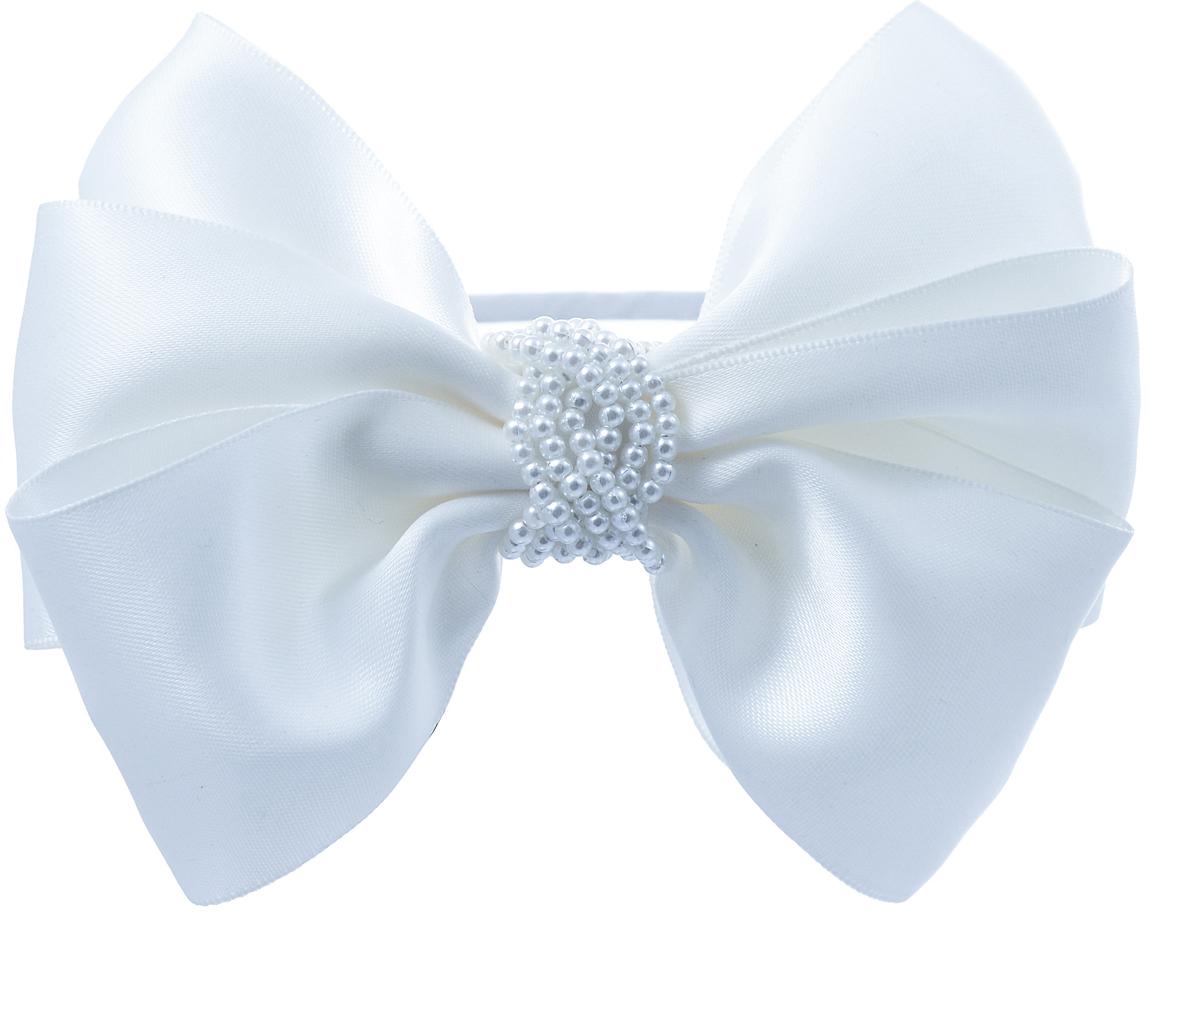 Ободок для волос Malina By Андерсен Монблан, цвет: белый. 41710об0241710об02